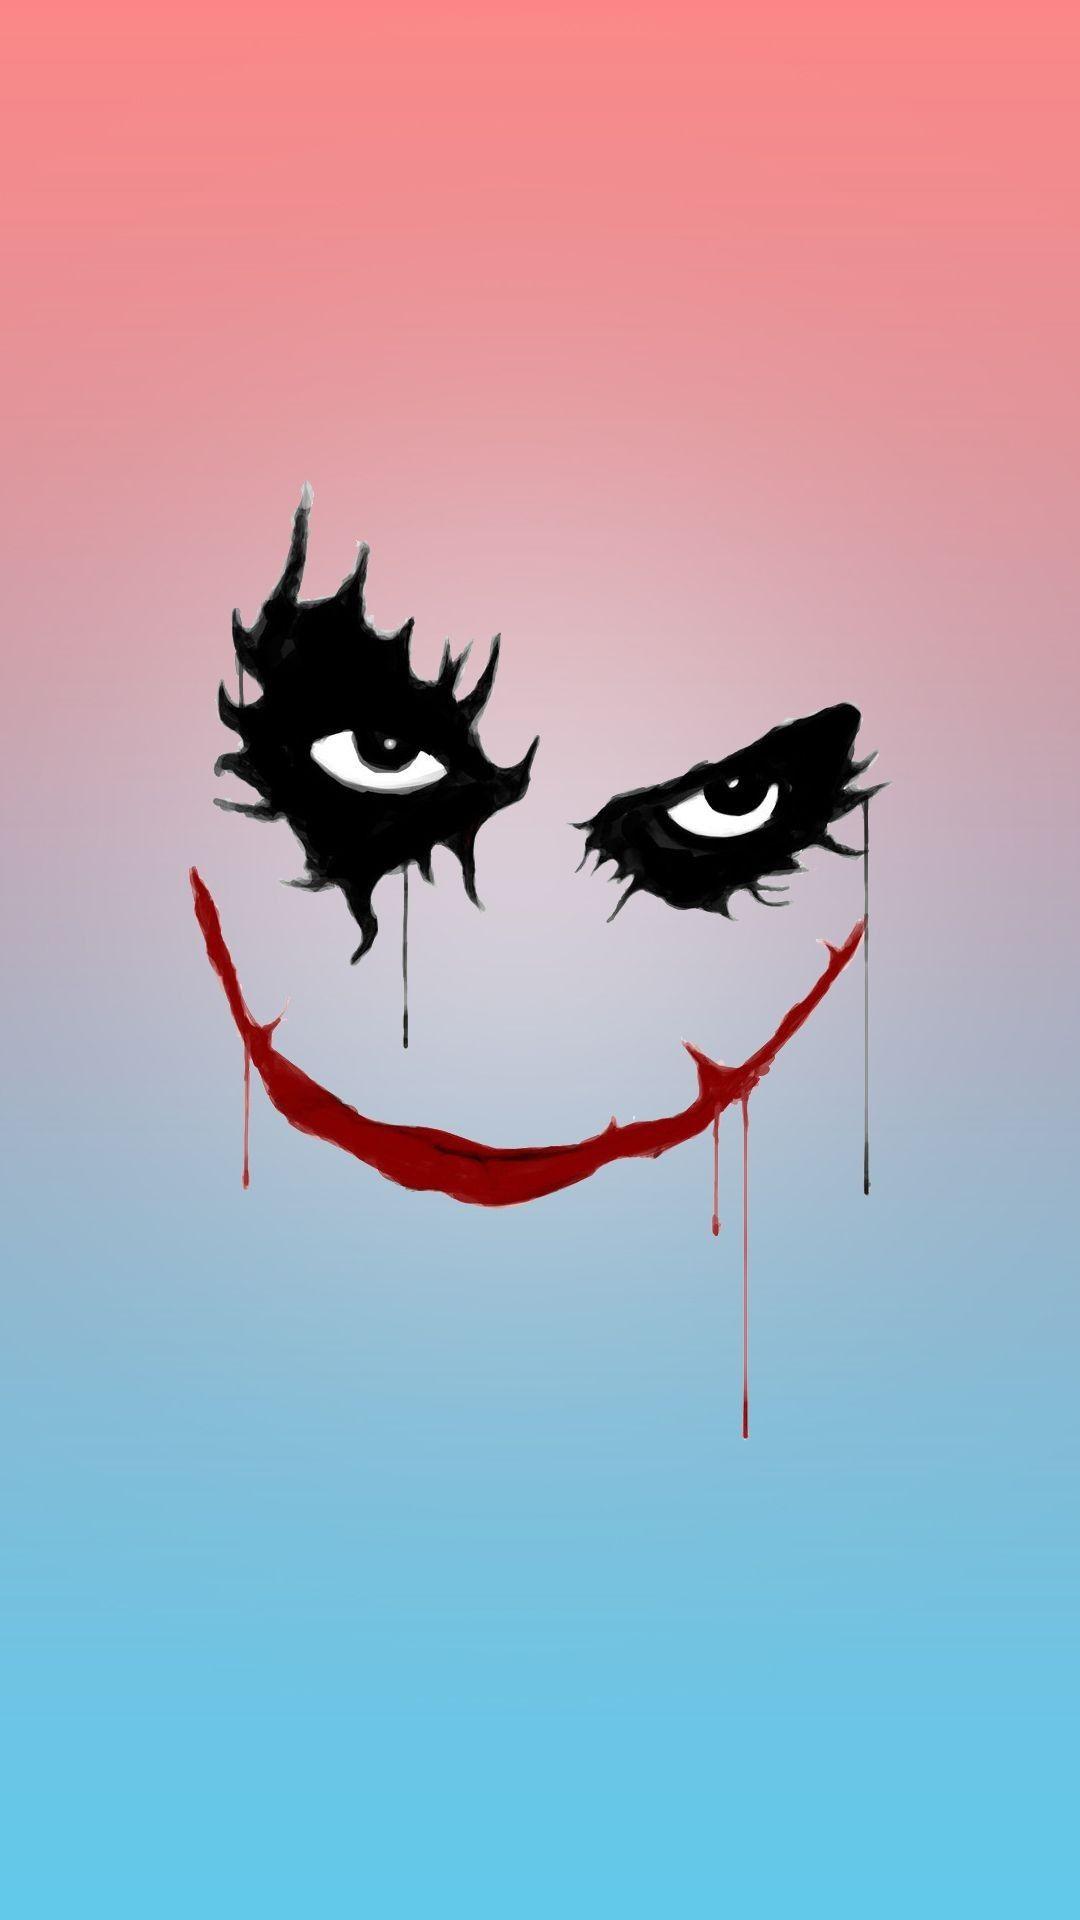 Joker 2019 Movie Mobile Wallpaper In 2020 Joker Iphone Wallpaper Joker Wallpapers Batman Joker Wallpaper